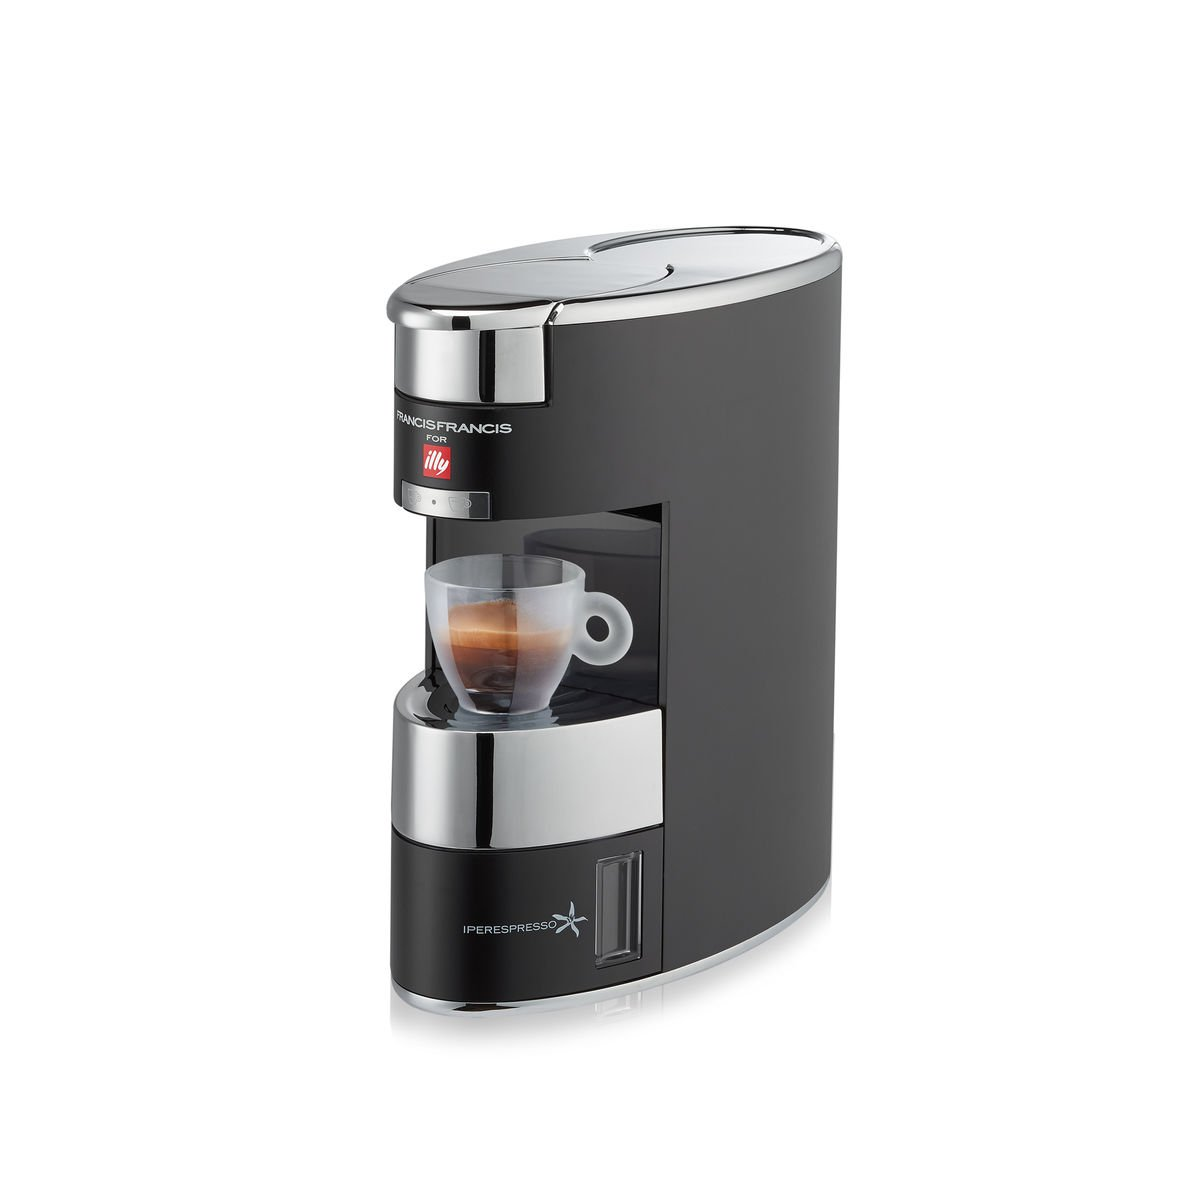 Illy iPerEspresso Home X9 Coffee and Espresso Machine Red